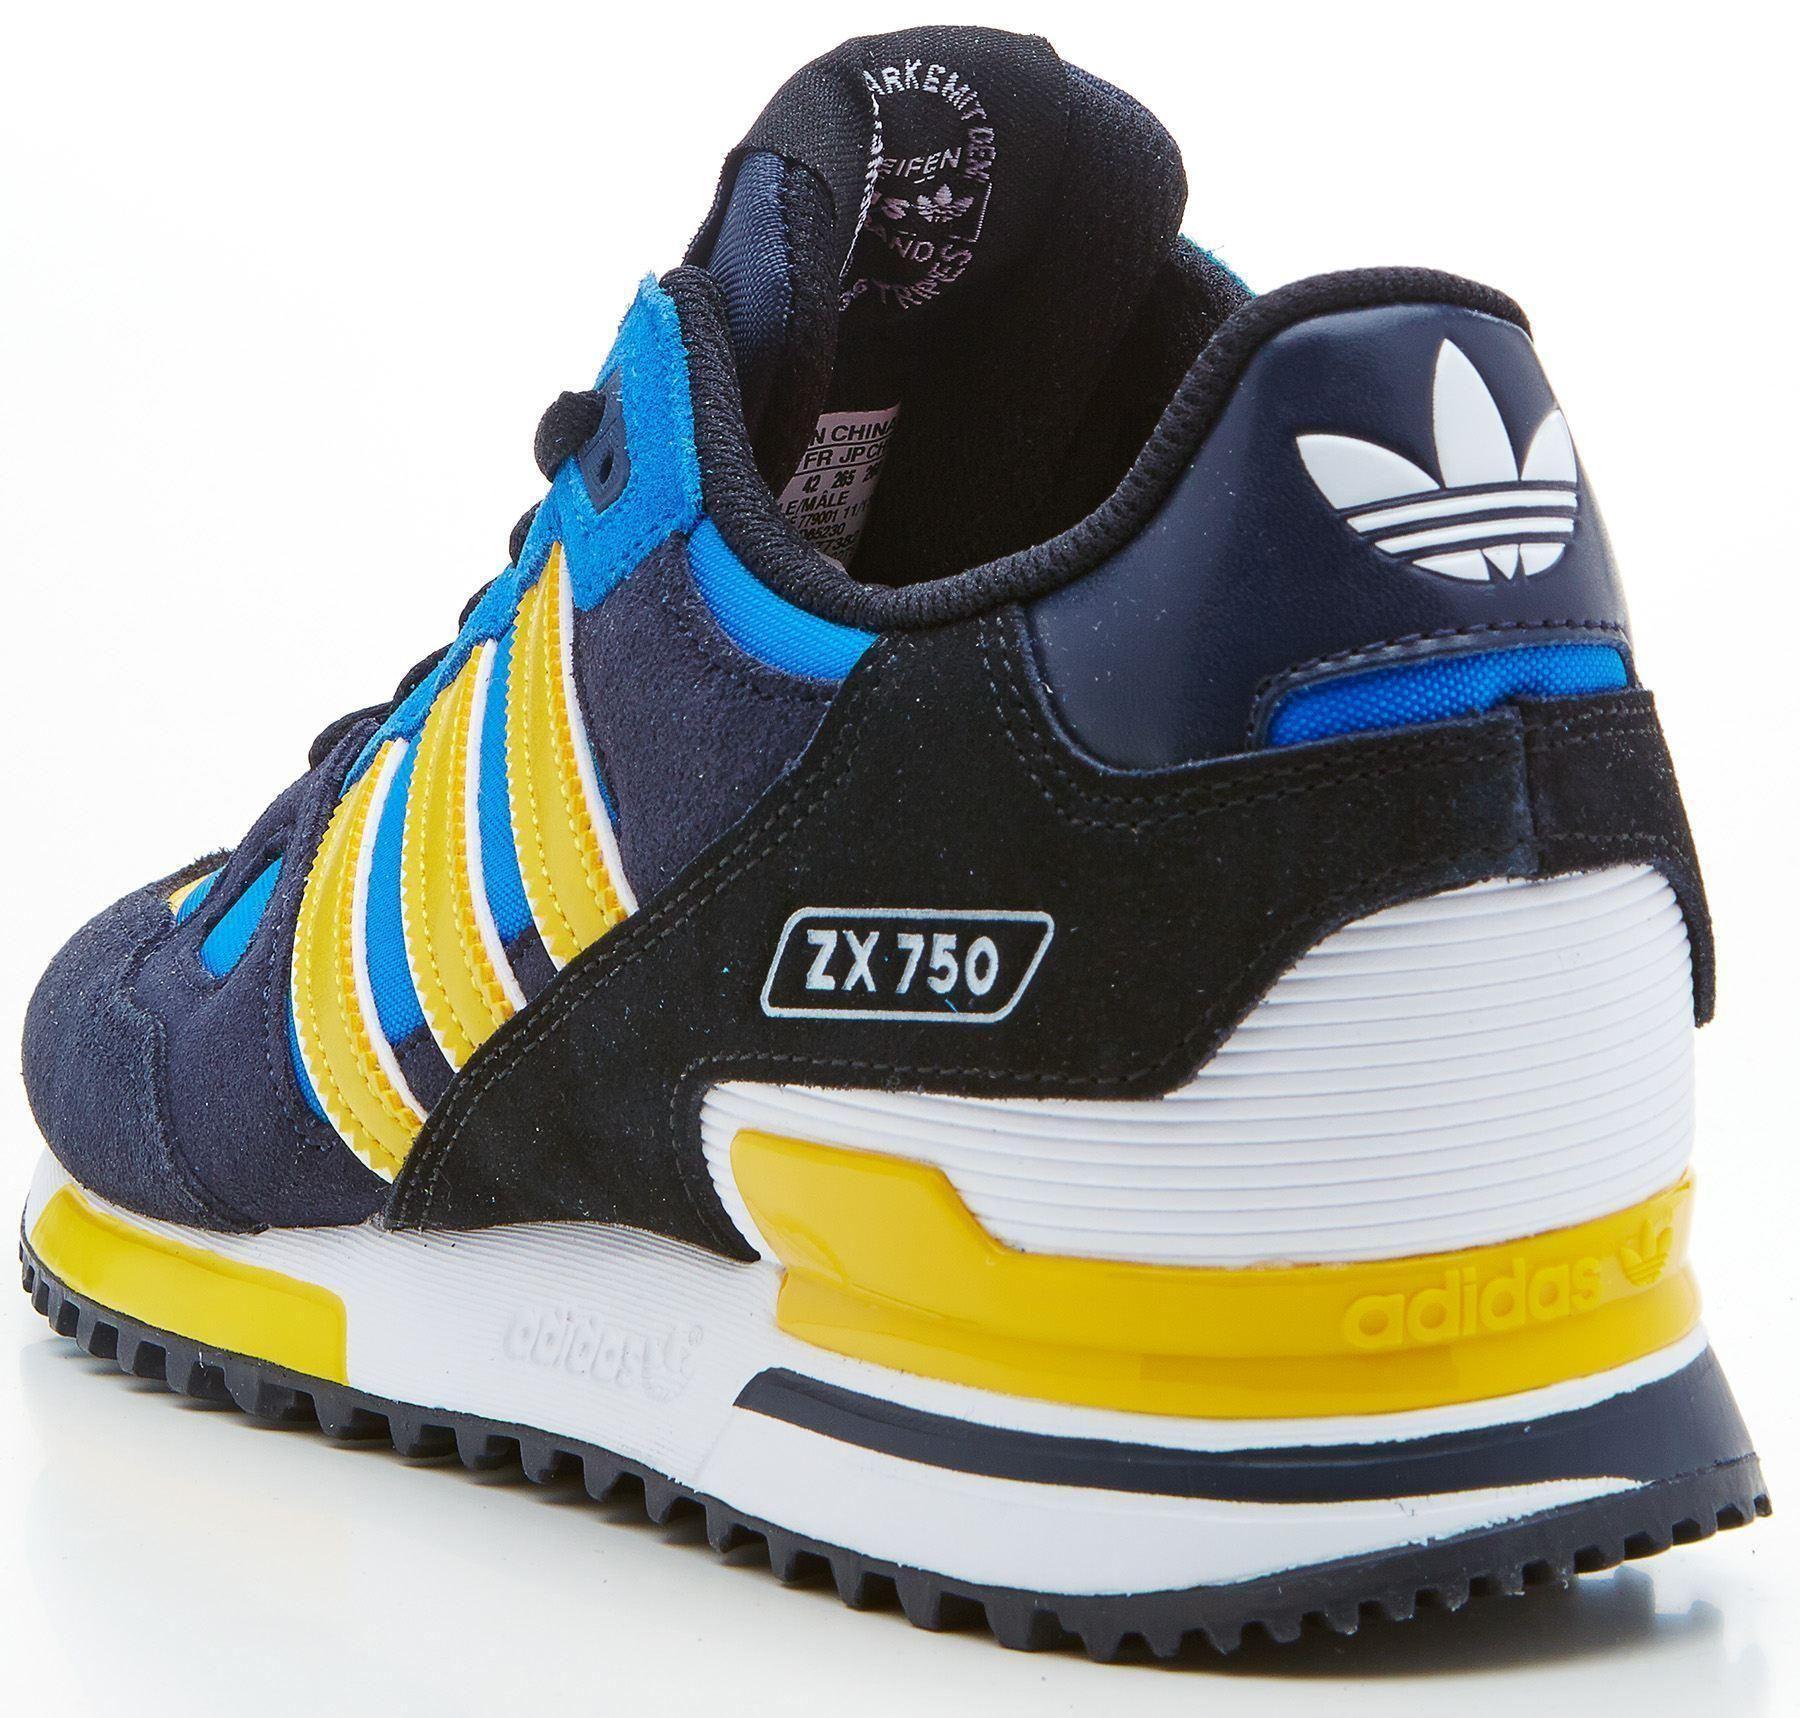 scarpe da tennis adidas 247625. 85.99 €. 123